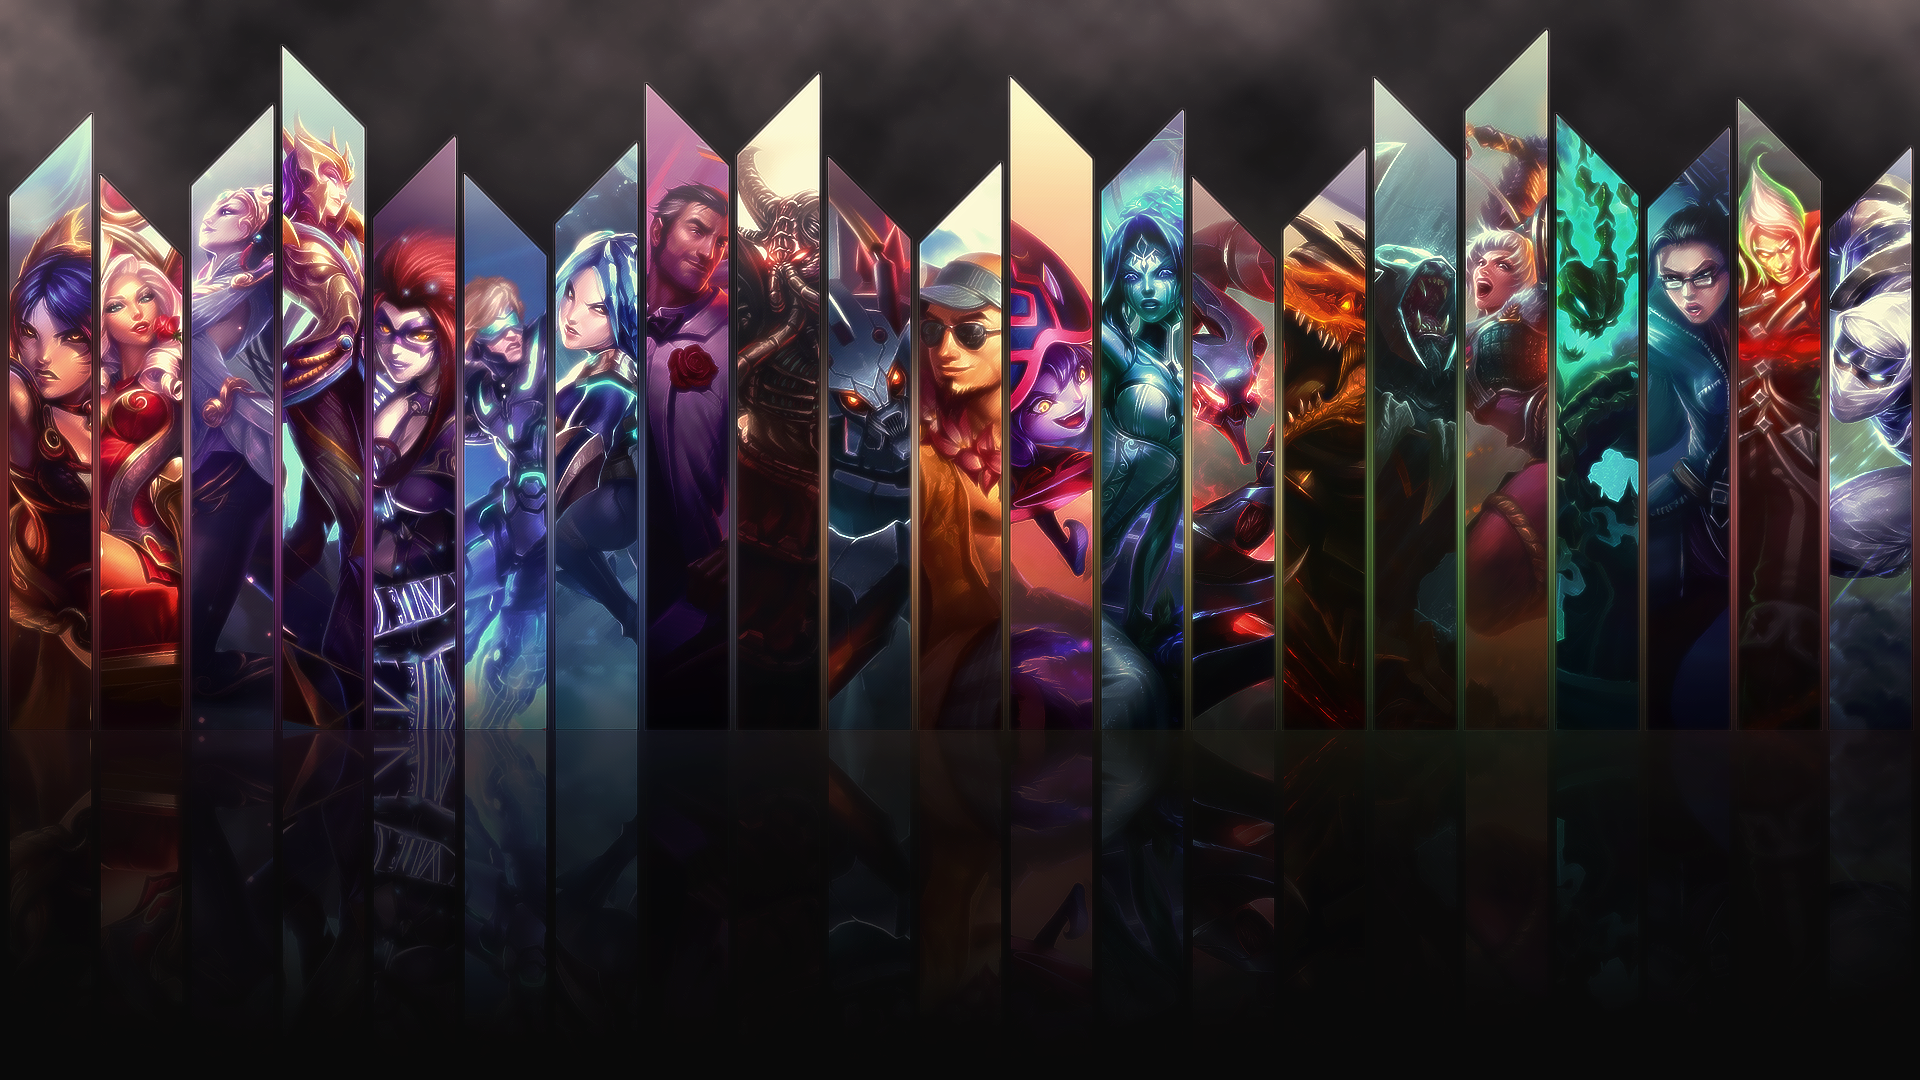 43 League Of Legends 4k Wallpaper On Wallpapersafari